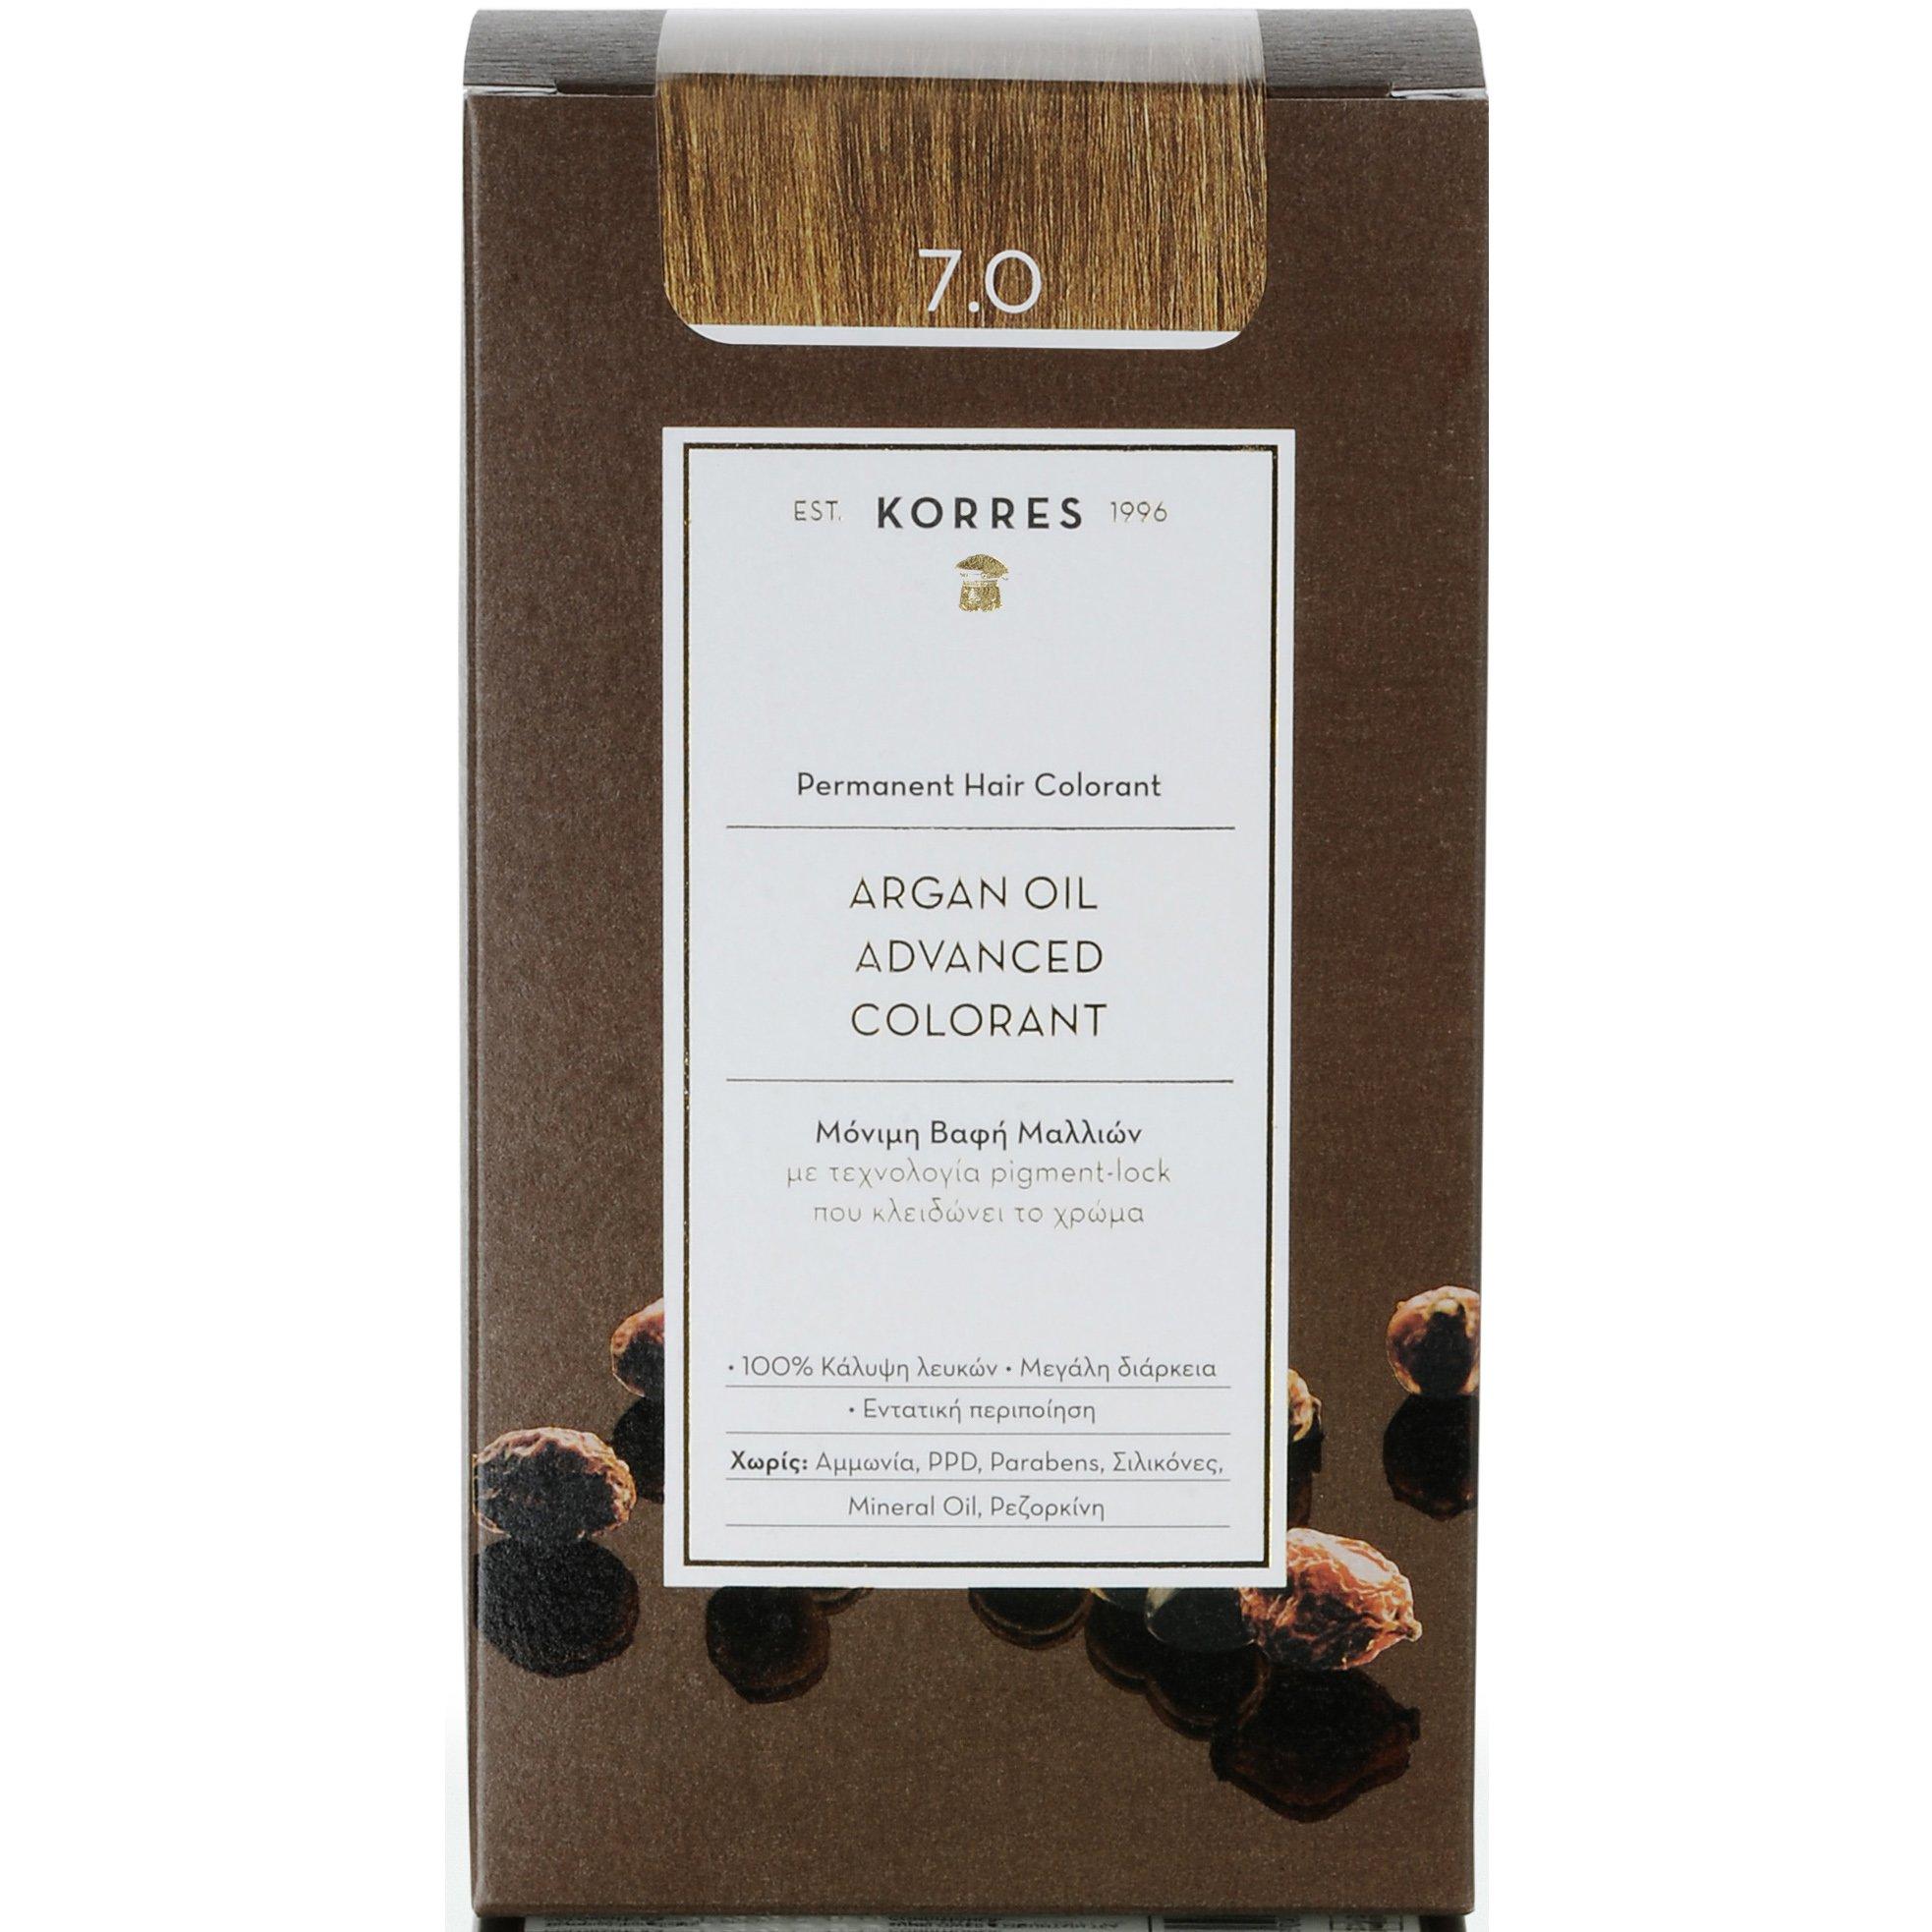 Korres Argan Oil Advanced Colorant Μόνιμη Βαφή Μαλλιών με Τεχνολογία Pigment-Lock που Κλειδώνει το Χρώμα 50ml – 7.0 ΞΑΝΘΟ ΦΥΣΙΚΟ